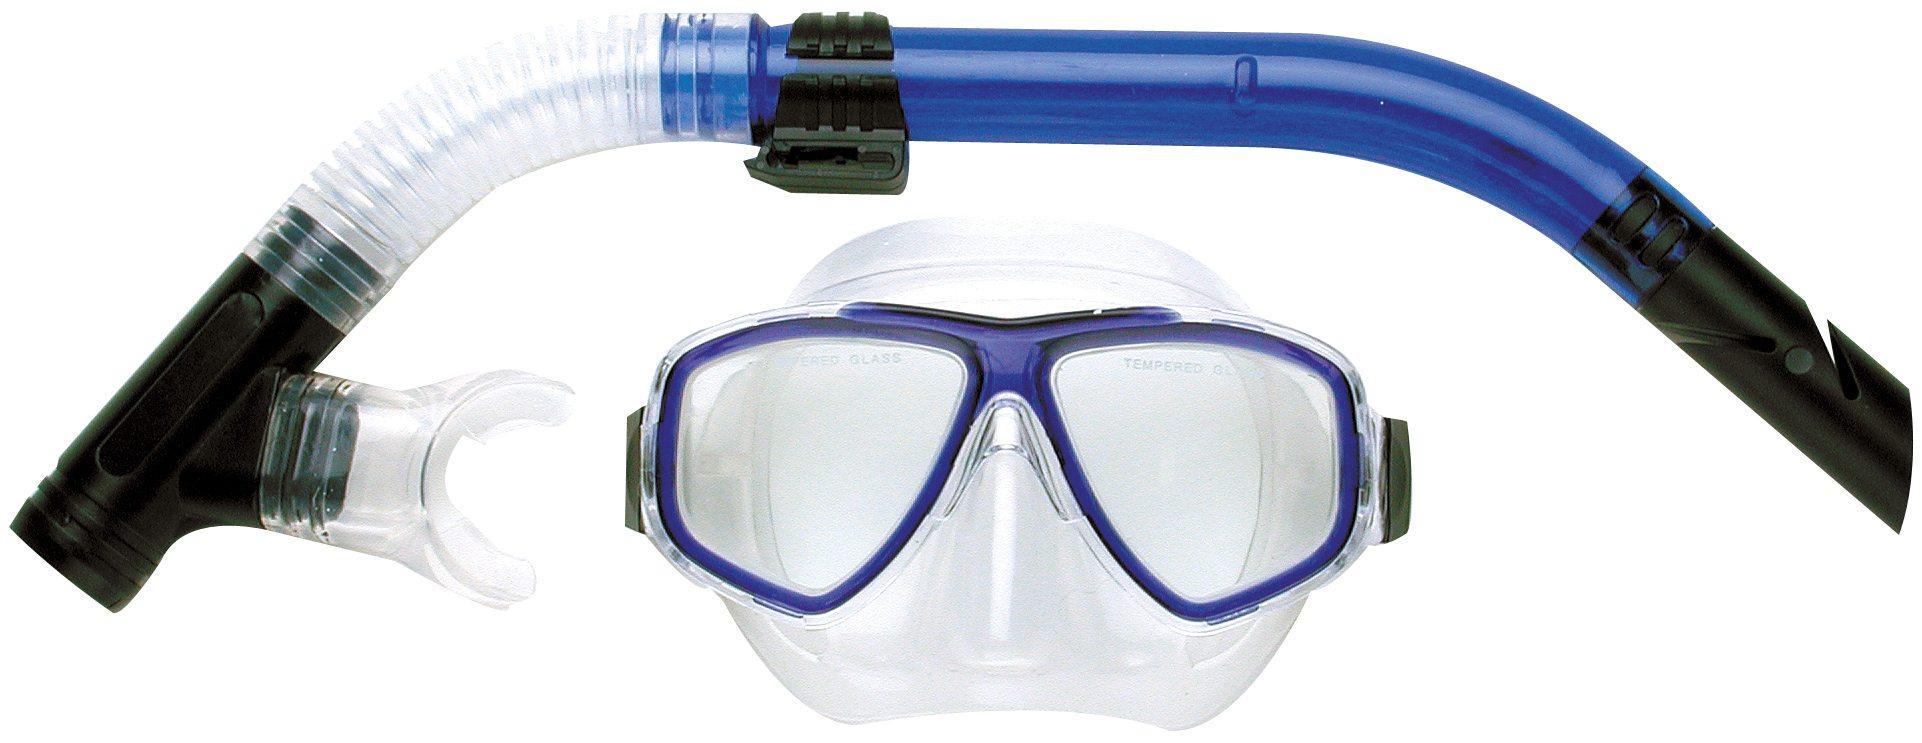 Snorkeling masks aristocrat-twinlens-silic-set